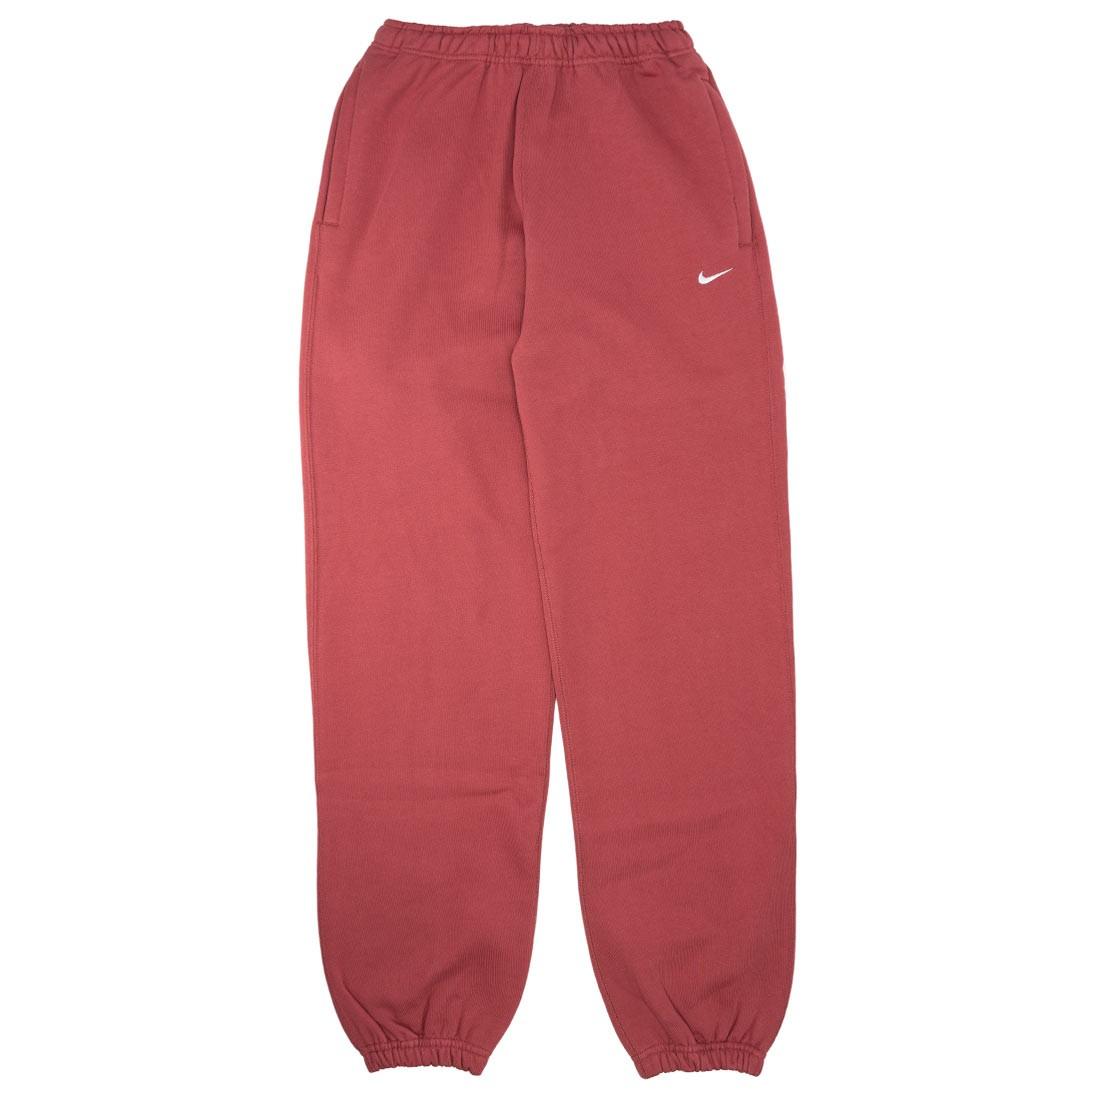 NikeLab Women Energy Fleece Pants (cedar / white)